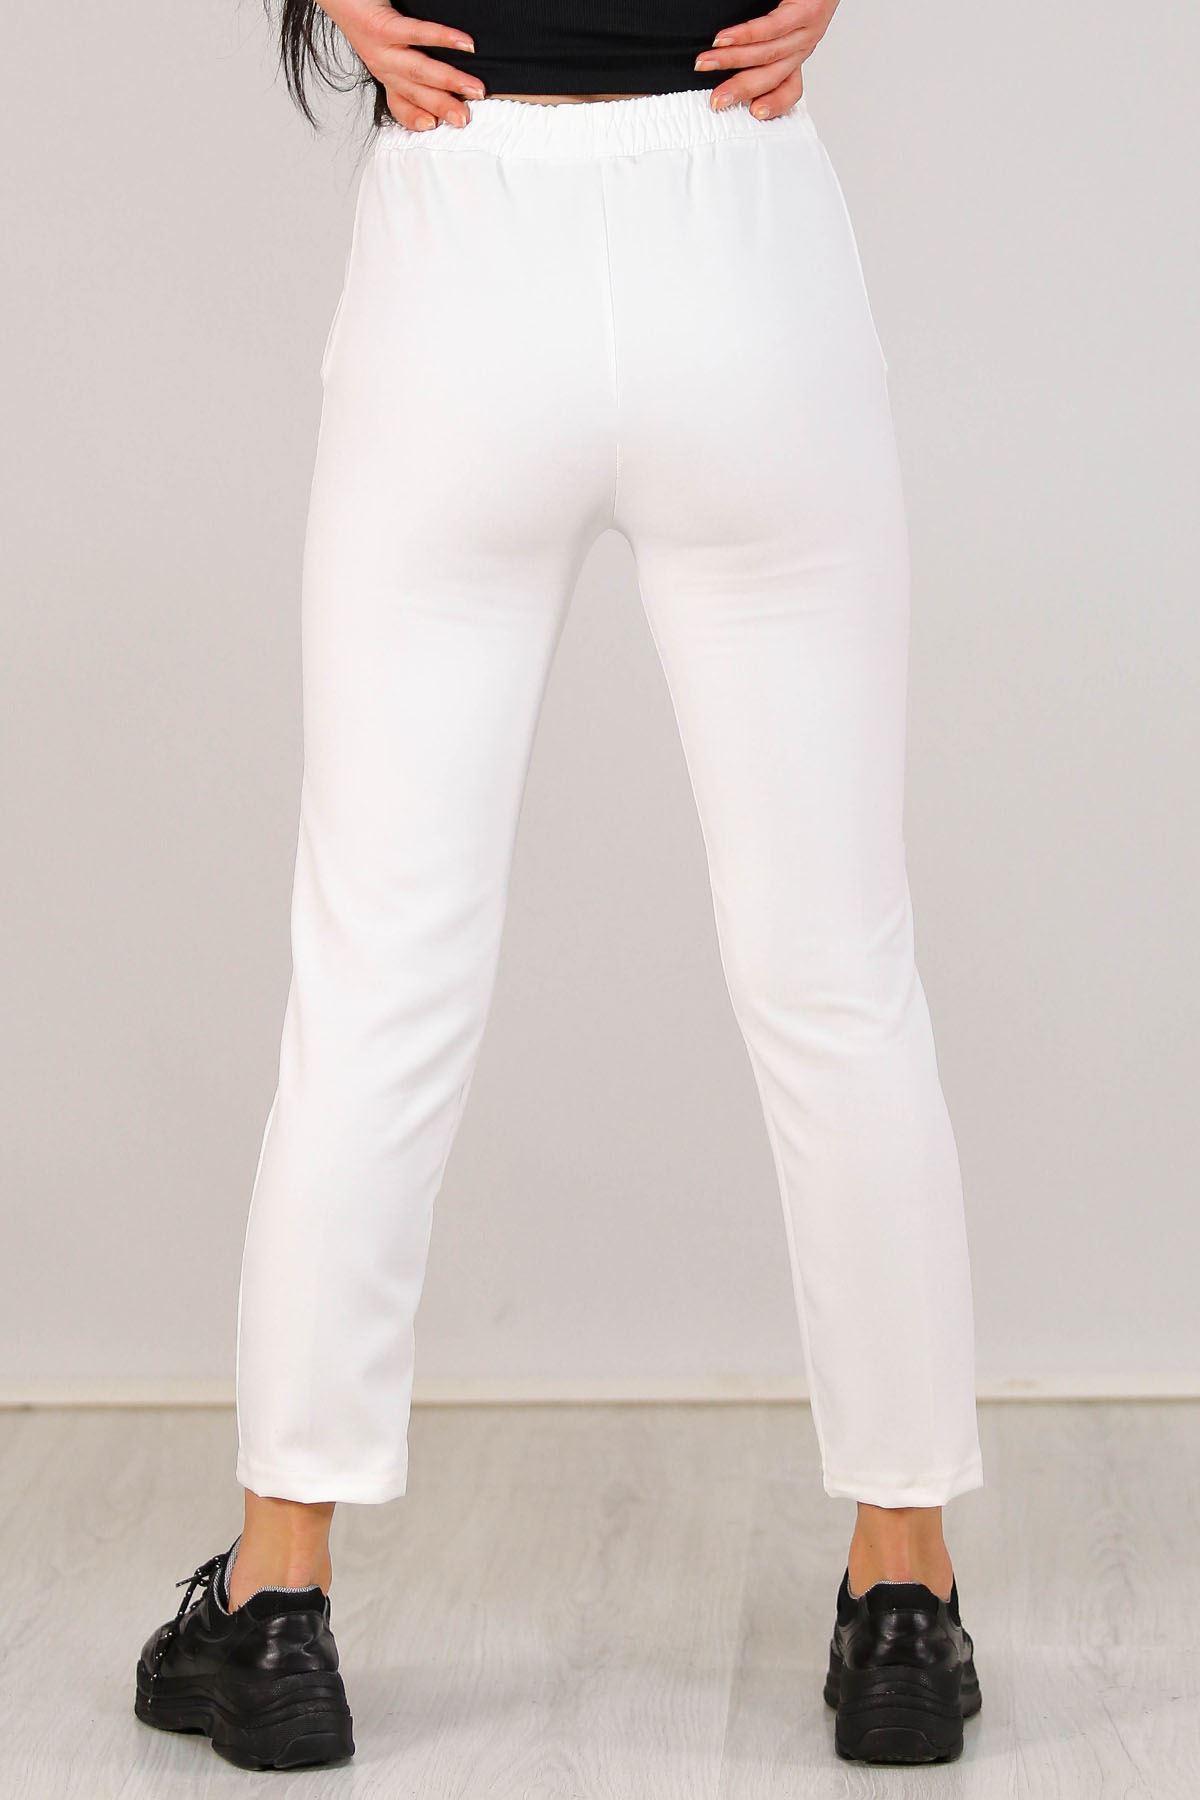 Ayrobin Pantolon Beyaz - 5256.1247.